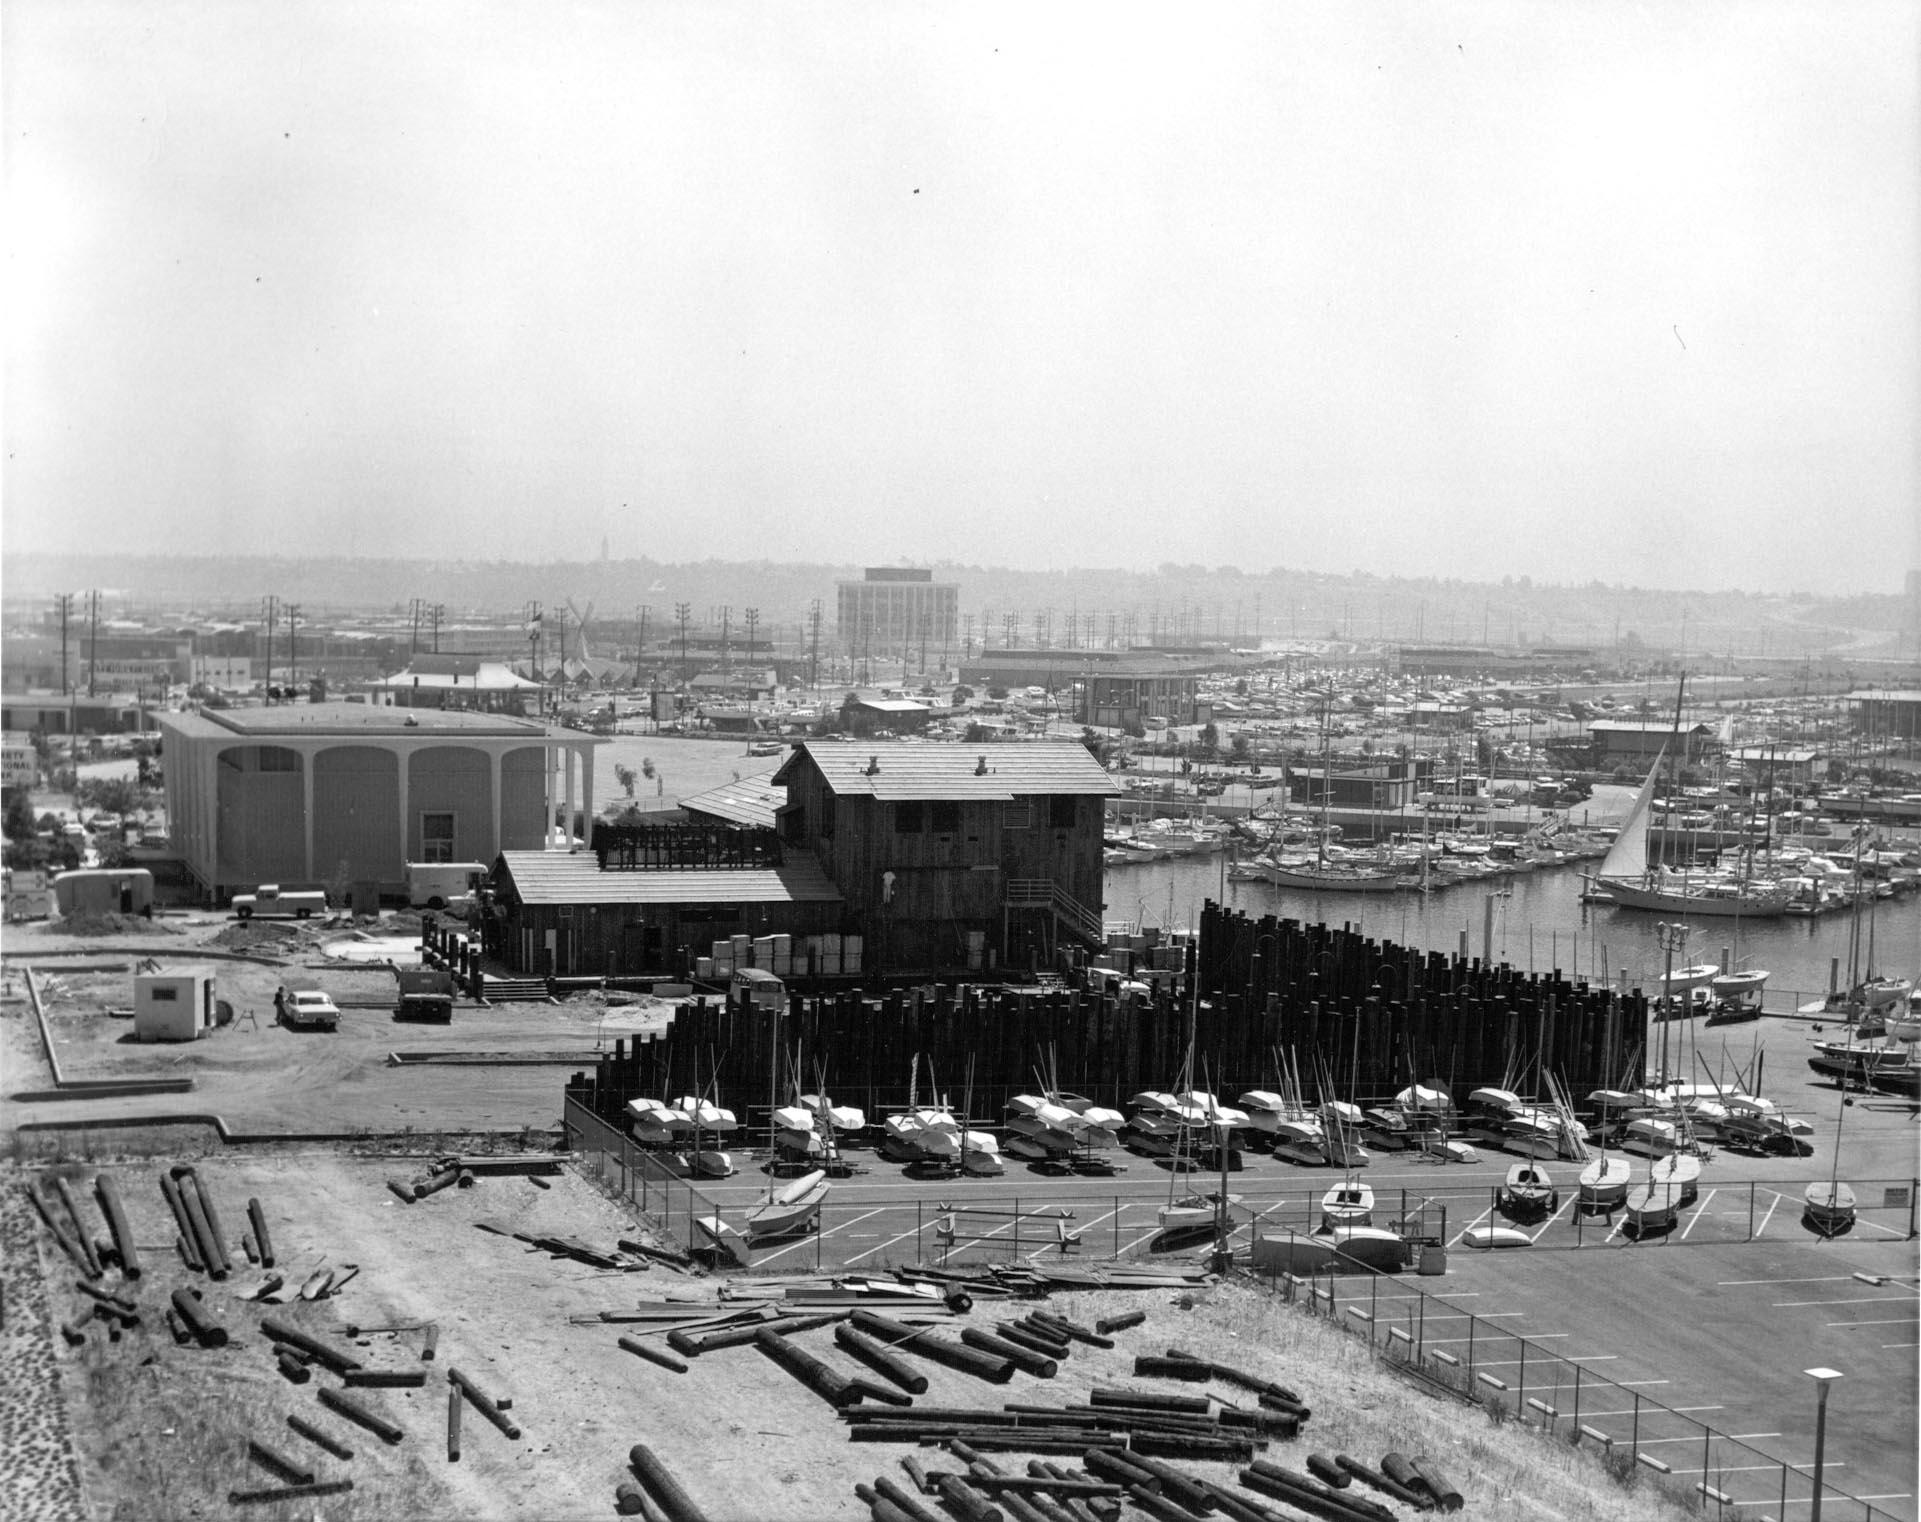 hm177bw-aerial-warehouse-restaurant-under-construction-1969